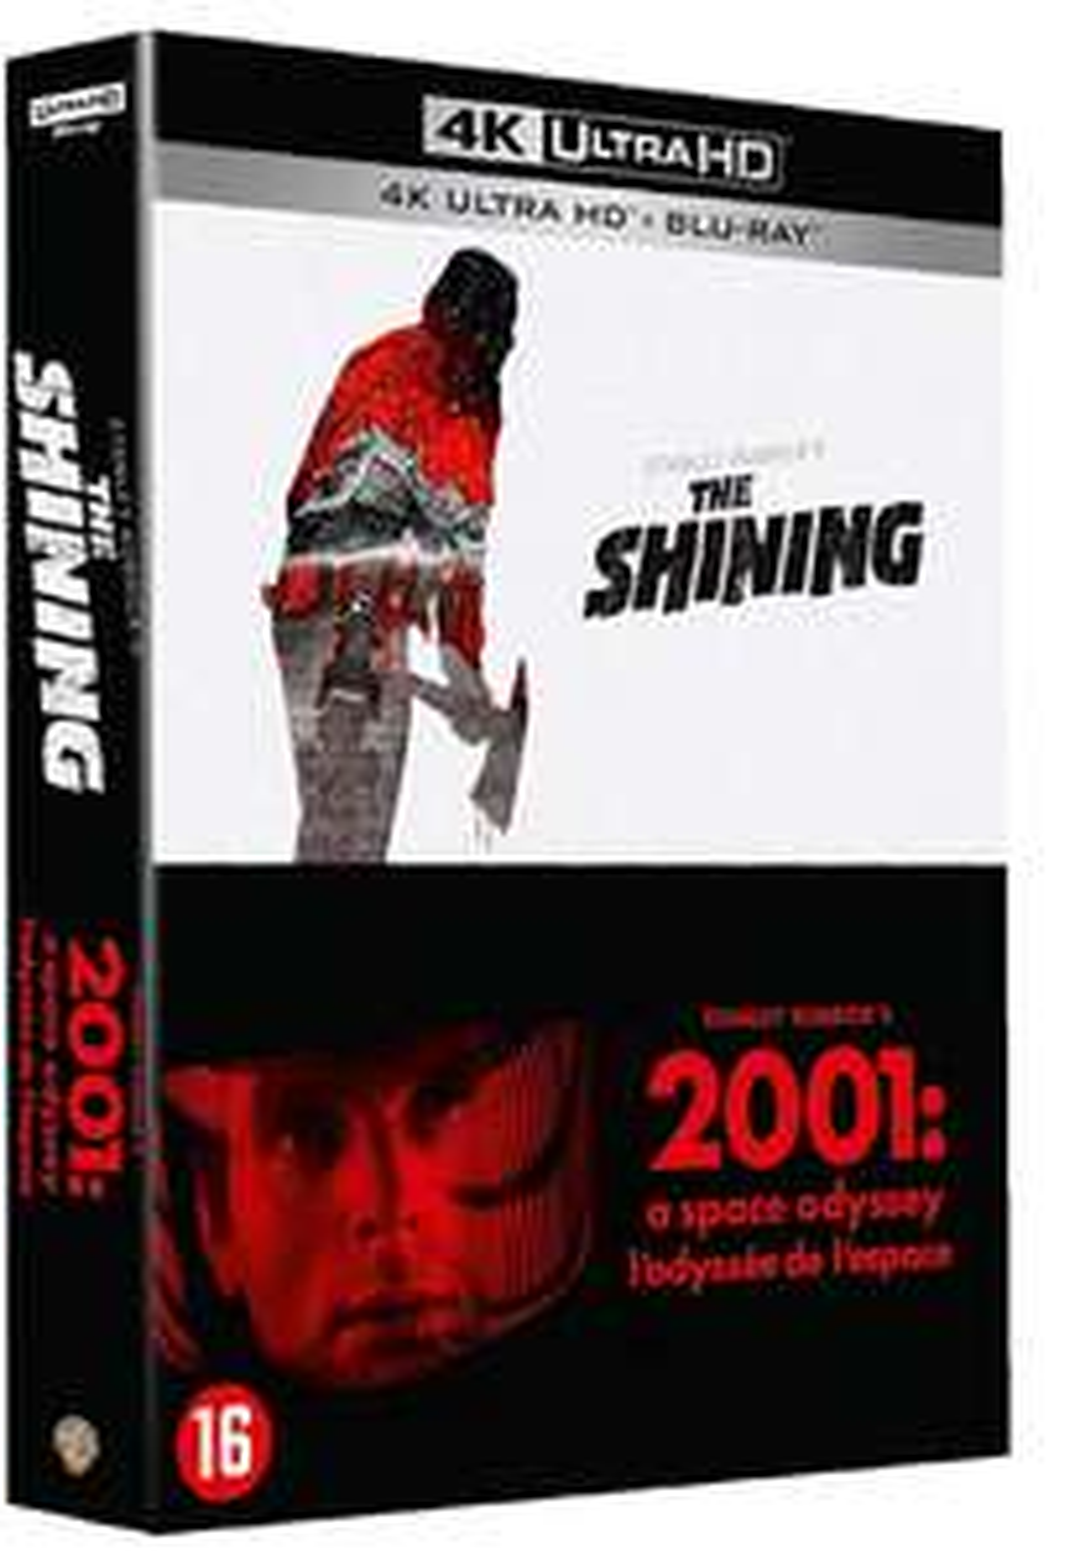 Coffret Blu-ray 4k : Kubrick Shining + 2001 l'odyssée de l'espace